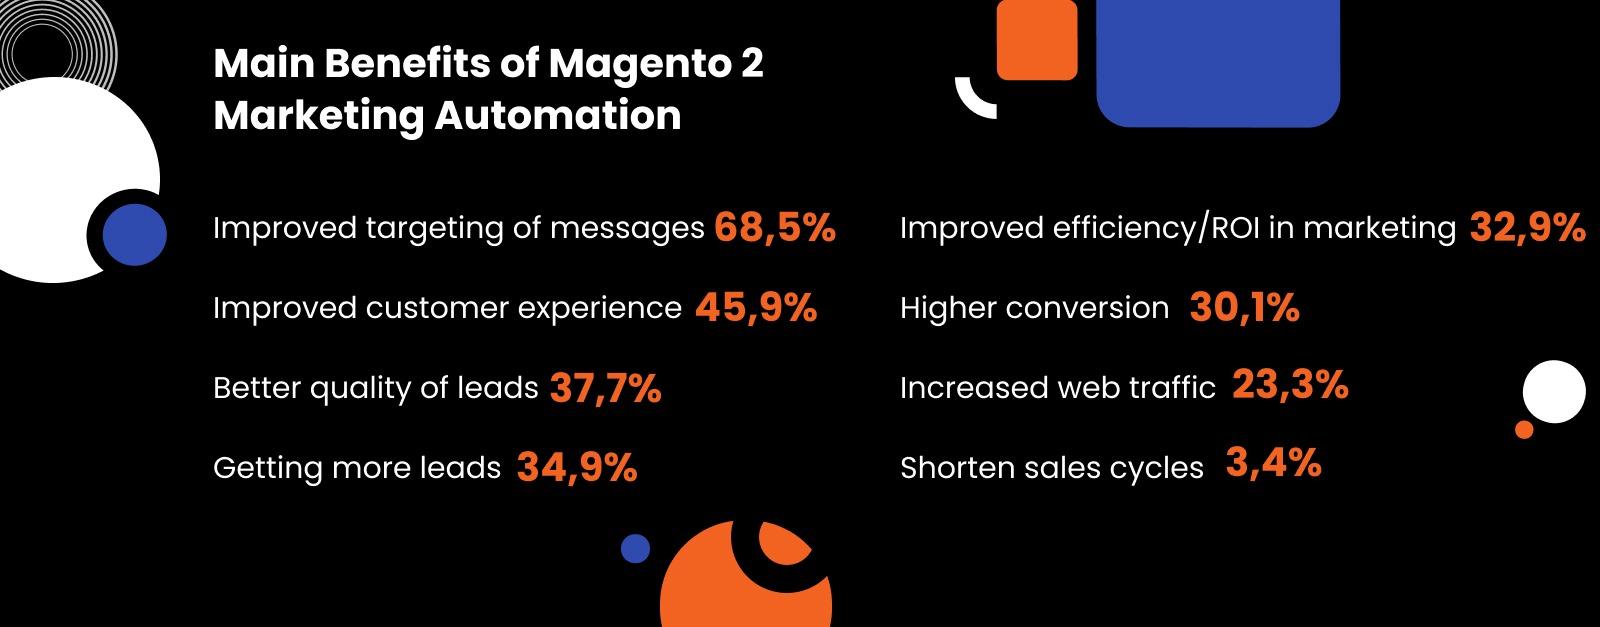 Main Benefits of Magento 2 Marketing Automation